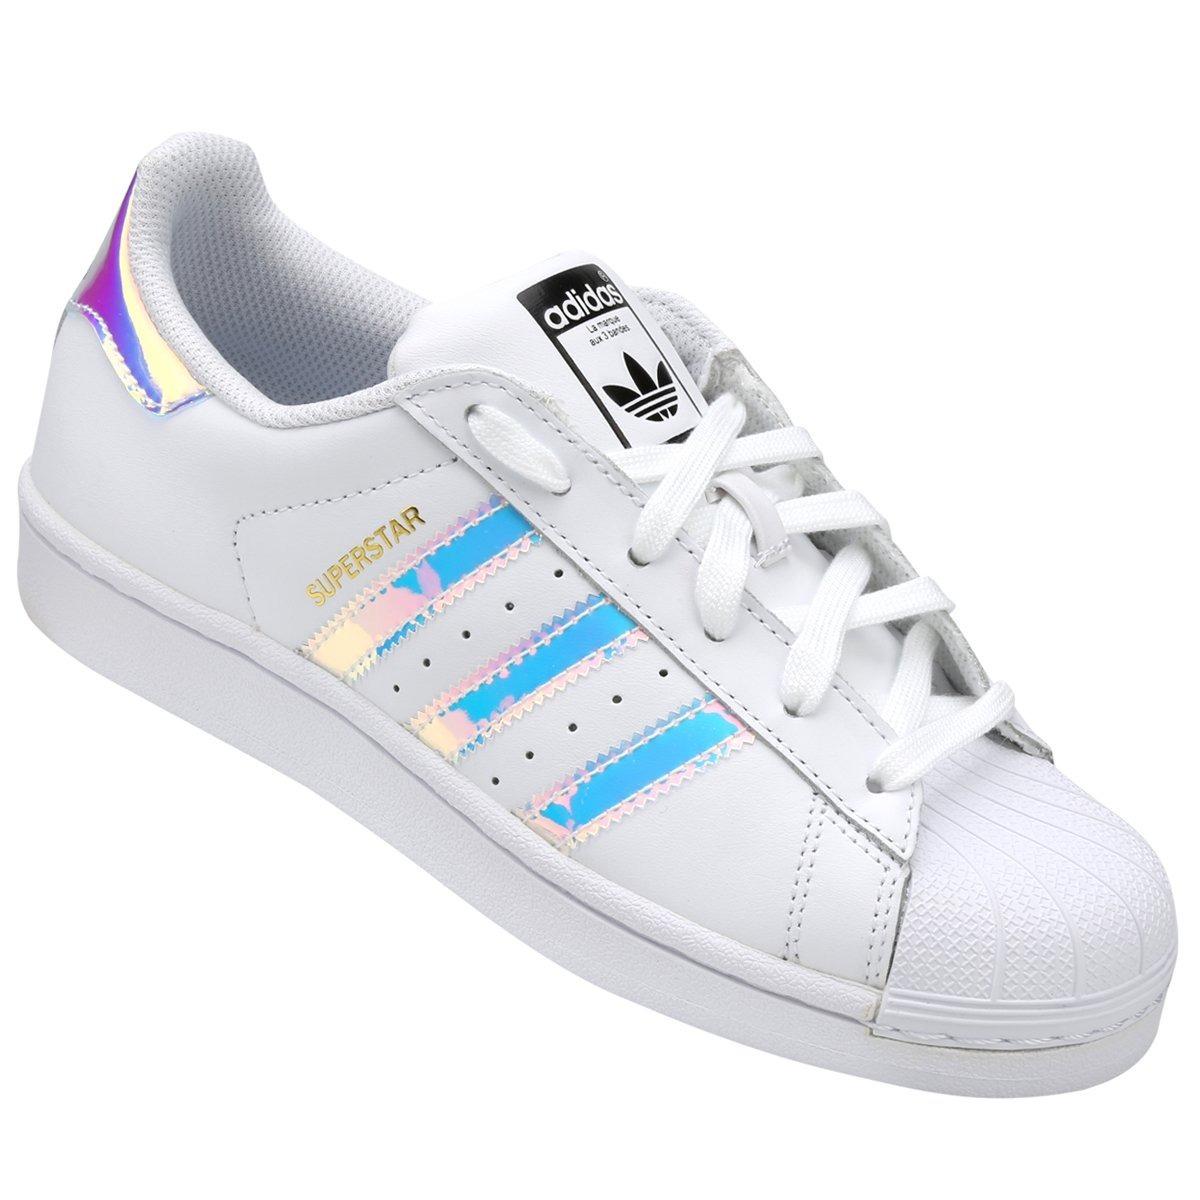 online retailer e9f4b ffe00 Tenis adidas Superstar Tornasol Iridescent Aq6278 Originale